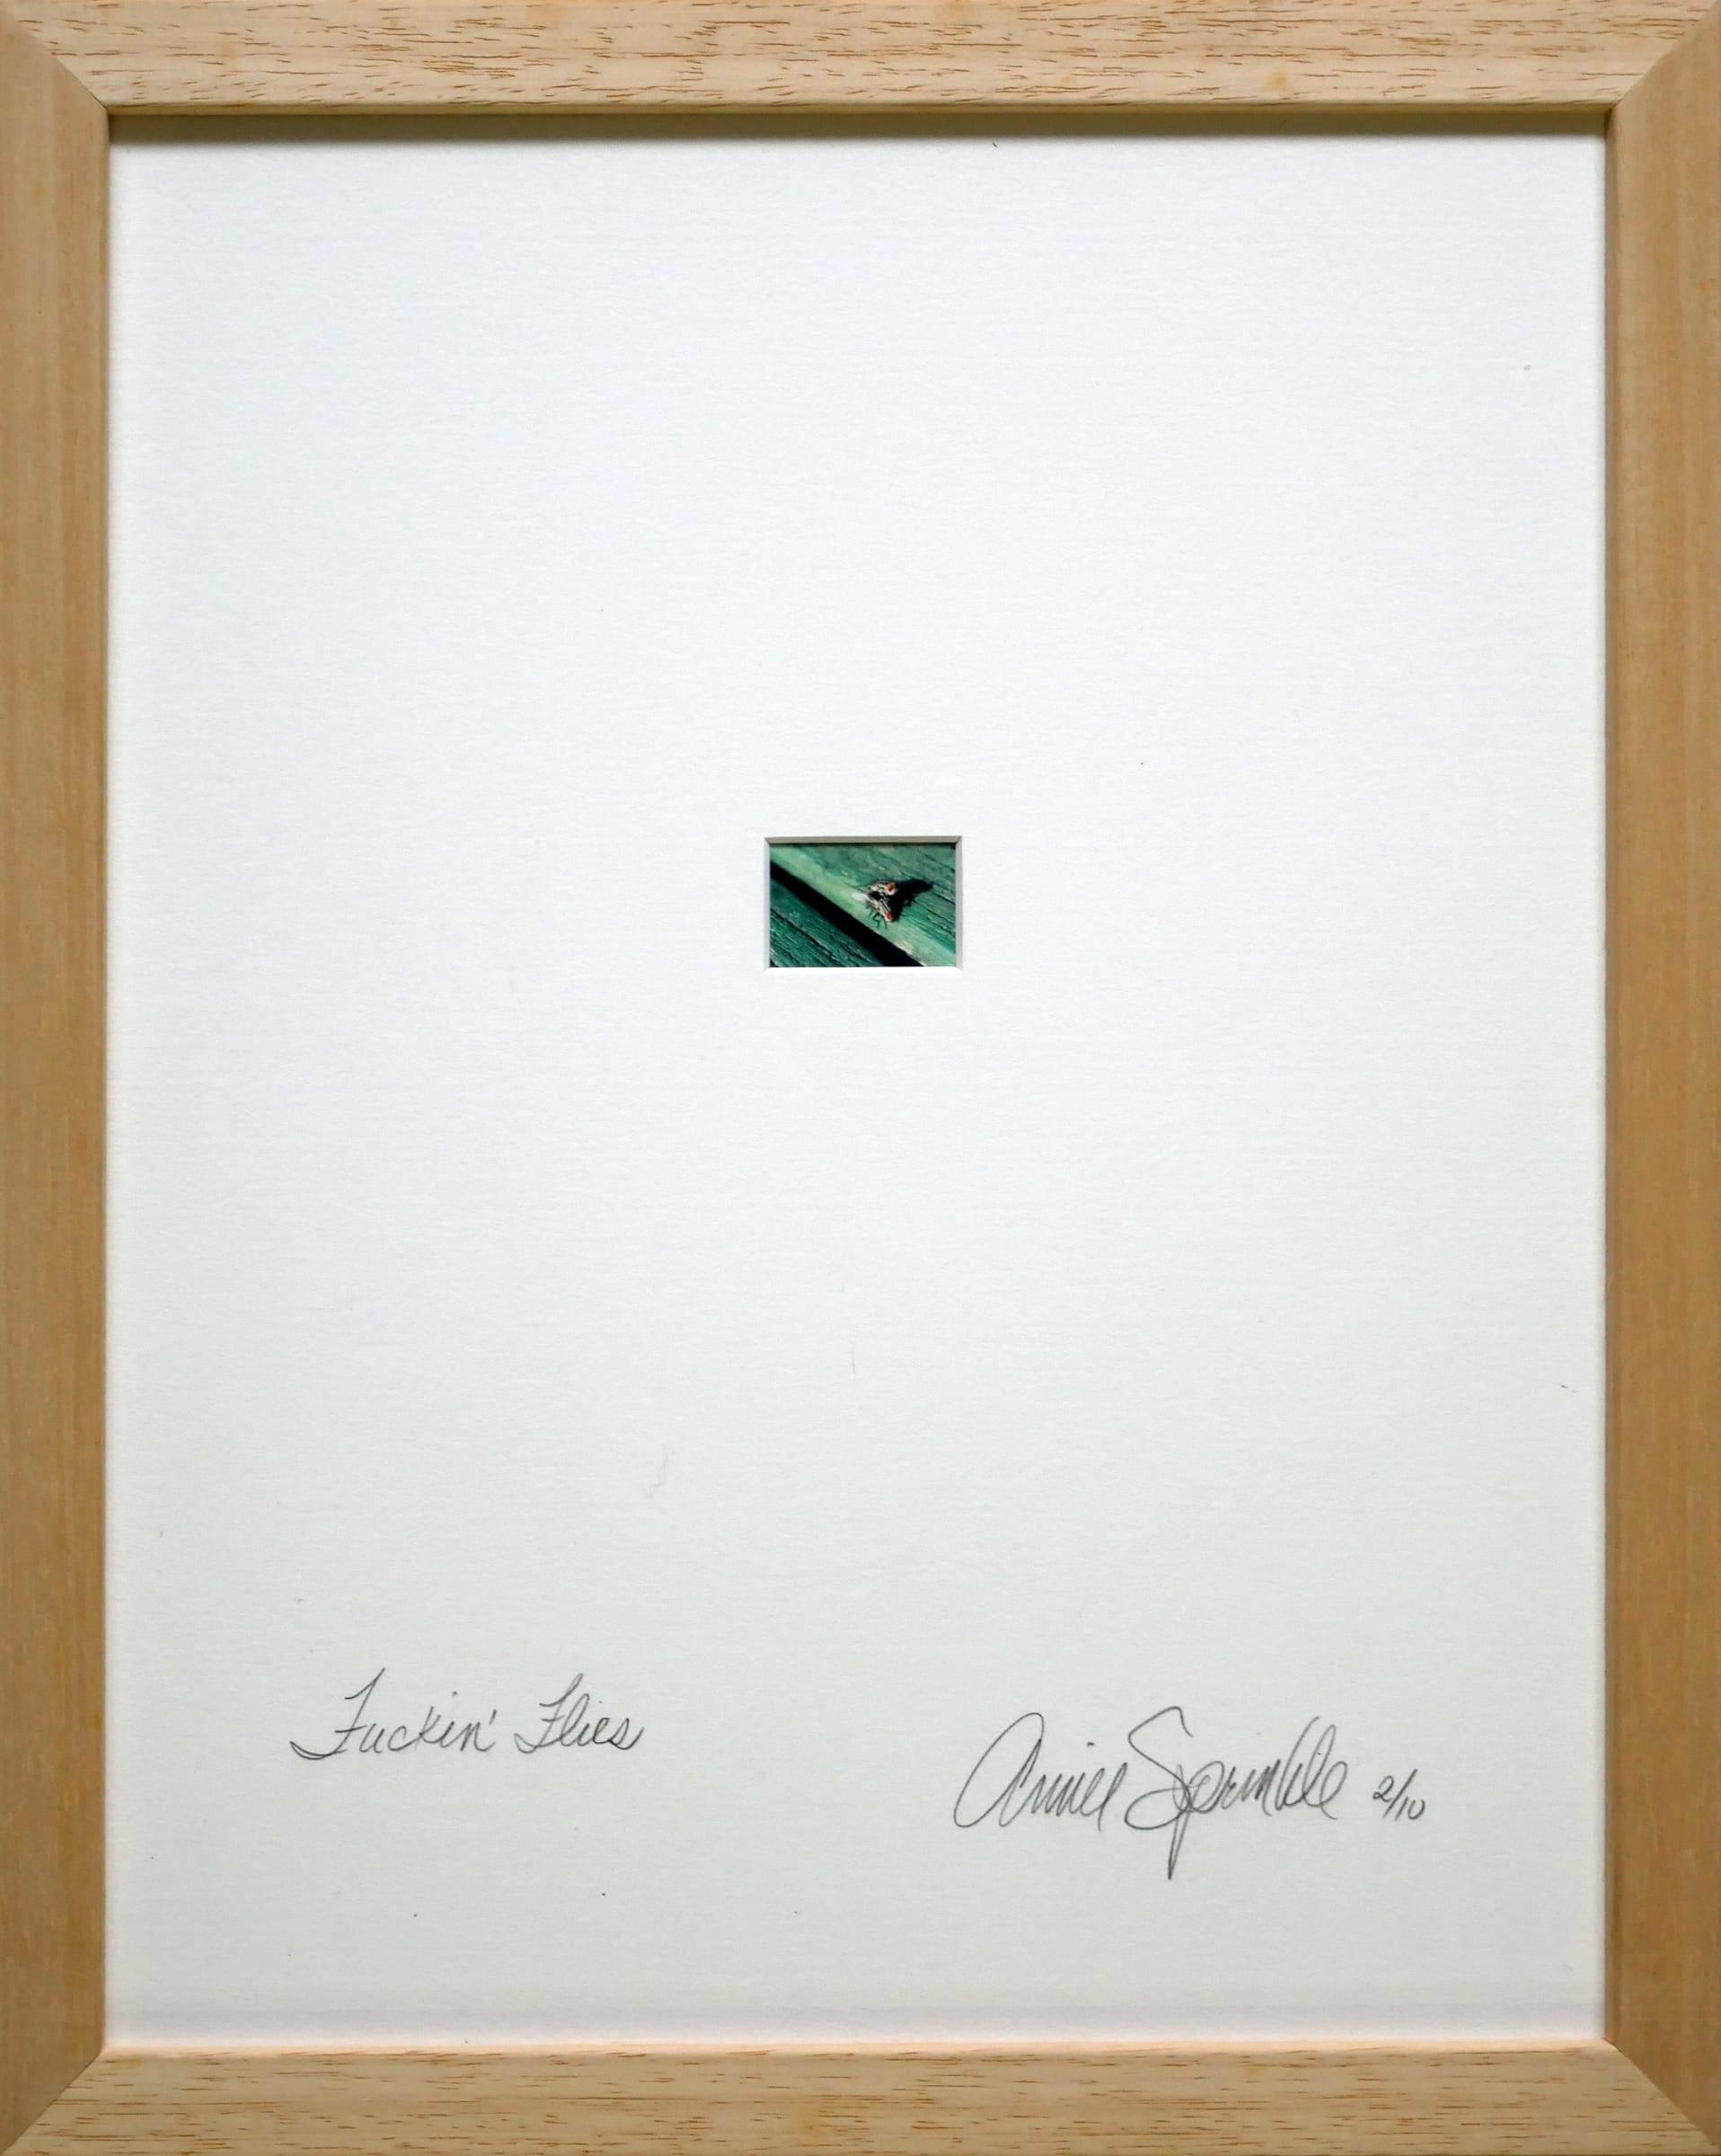 "<span class=""link fancybox-details-link""><a href=""/artists/113-annie-sprinkle/works/1335/"">View Detail Page</a></span><div class=""artist""><strong>Annie SPRINKLE</strong></div> <div class=""title""><em>Fucking flies</em>, 1999</div> <div class=""medium"">C-print on card board</div> <div class=""dimensions"">4 x 5.5 cm<br /> 1 5/8 x 2 1/8 in</div> <div class=""edition_details"">Edition of 10: this is 2/10</div><div class=""copyright_line"">Copyright the artist</div>"